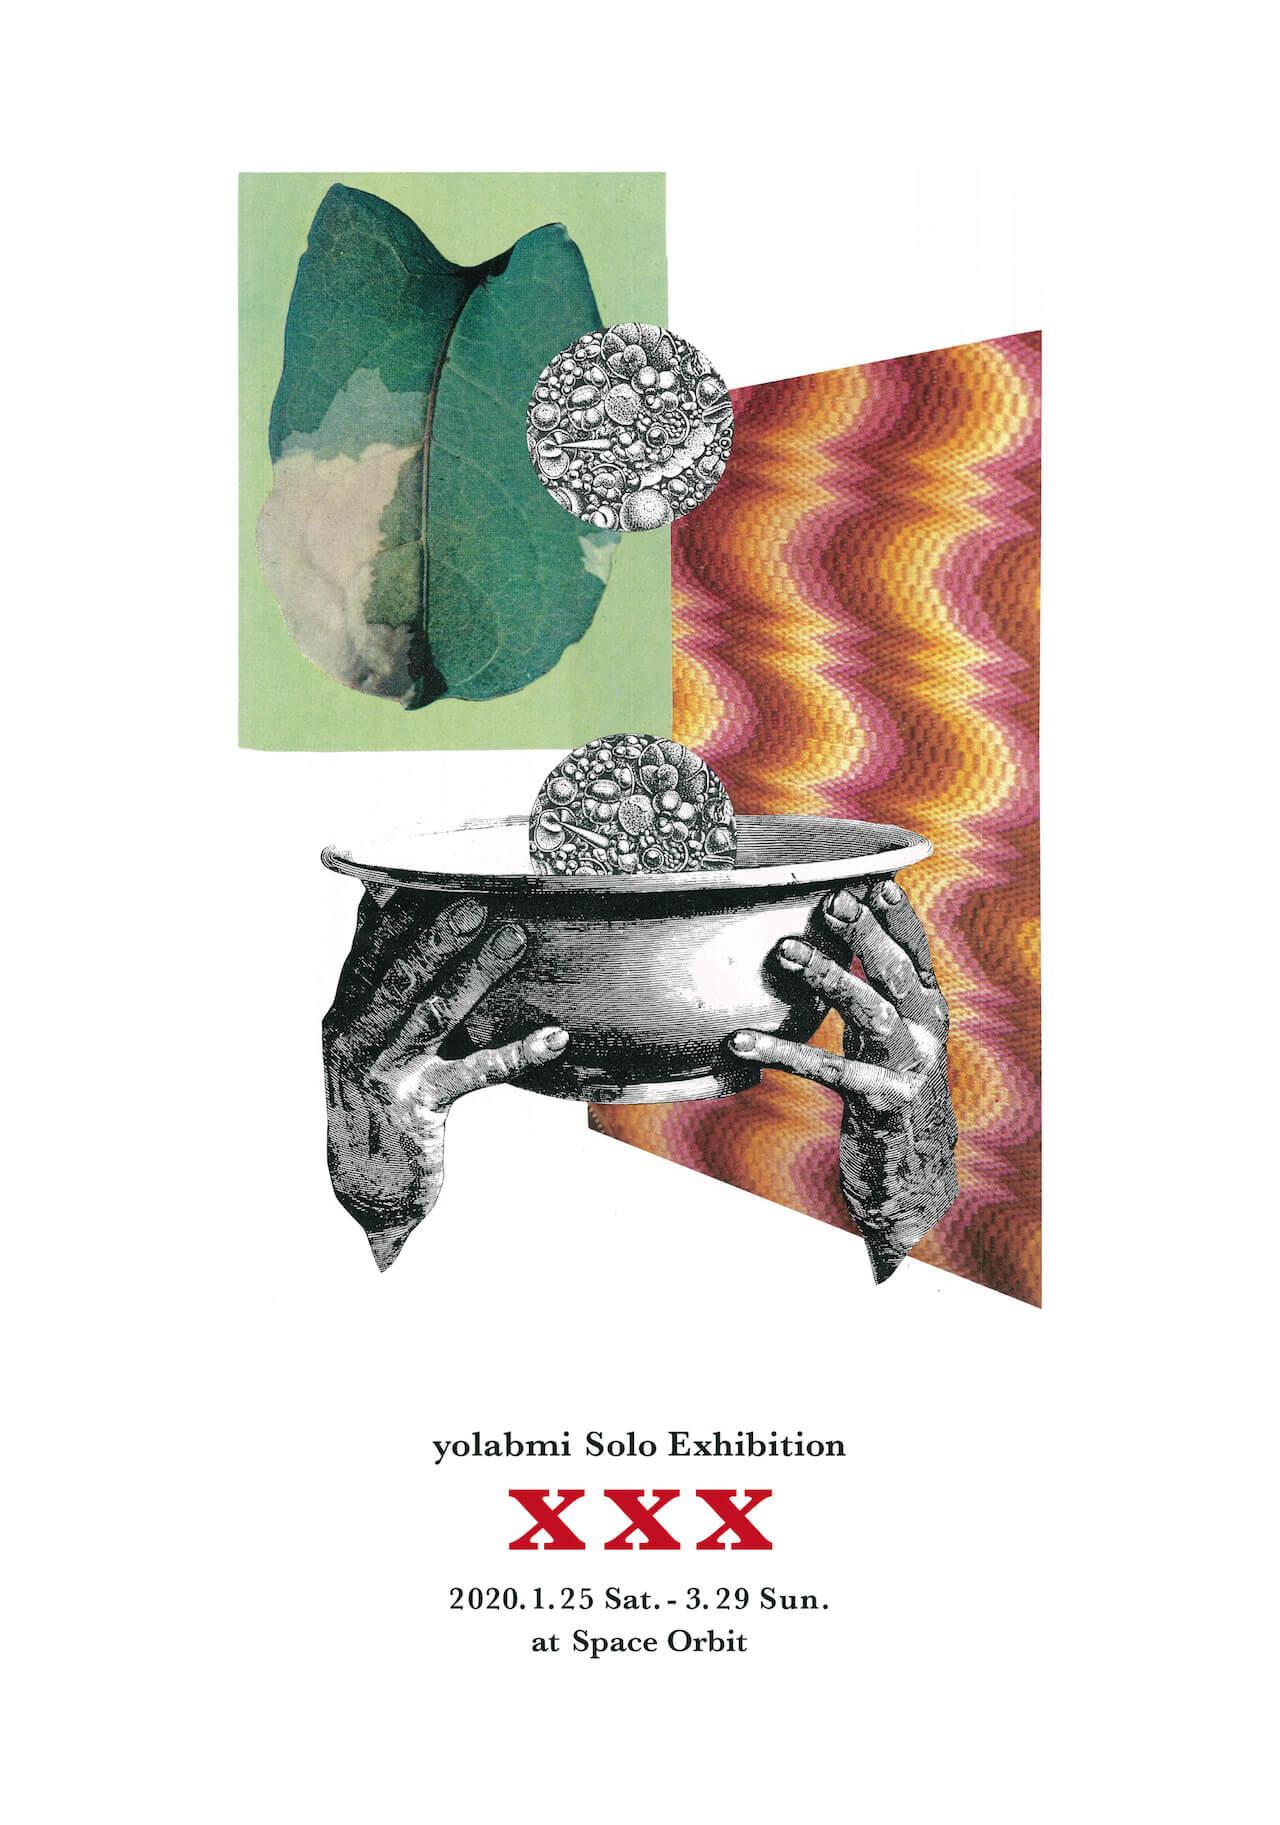 yolabmiが初のコラージュ個展「xxx」を開催|オープニング&クロージングパーティーにはDr.Nishimuraらが登場 music200123-yolabmi-xxx-1